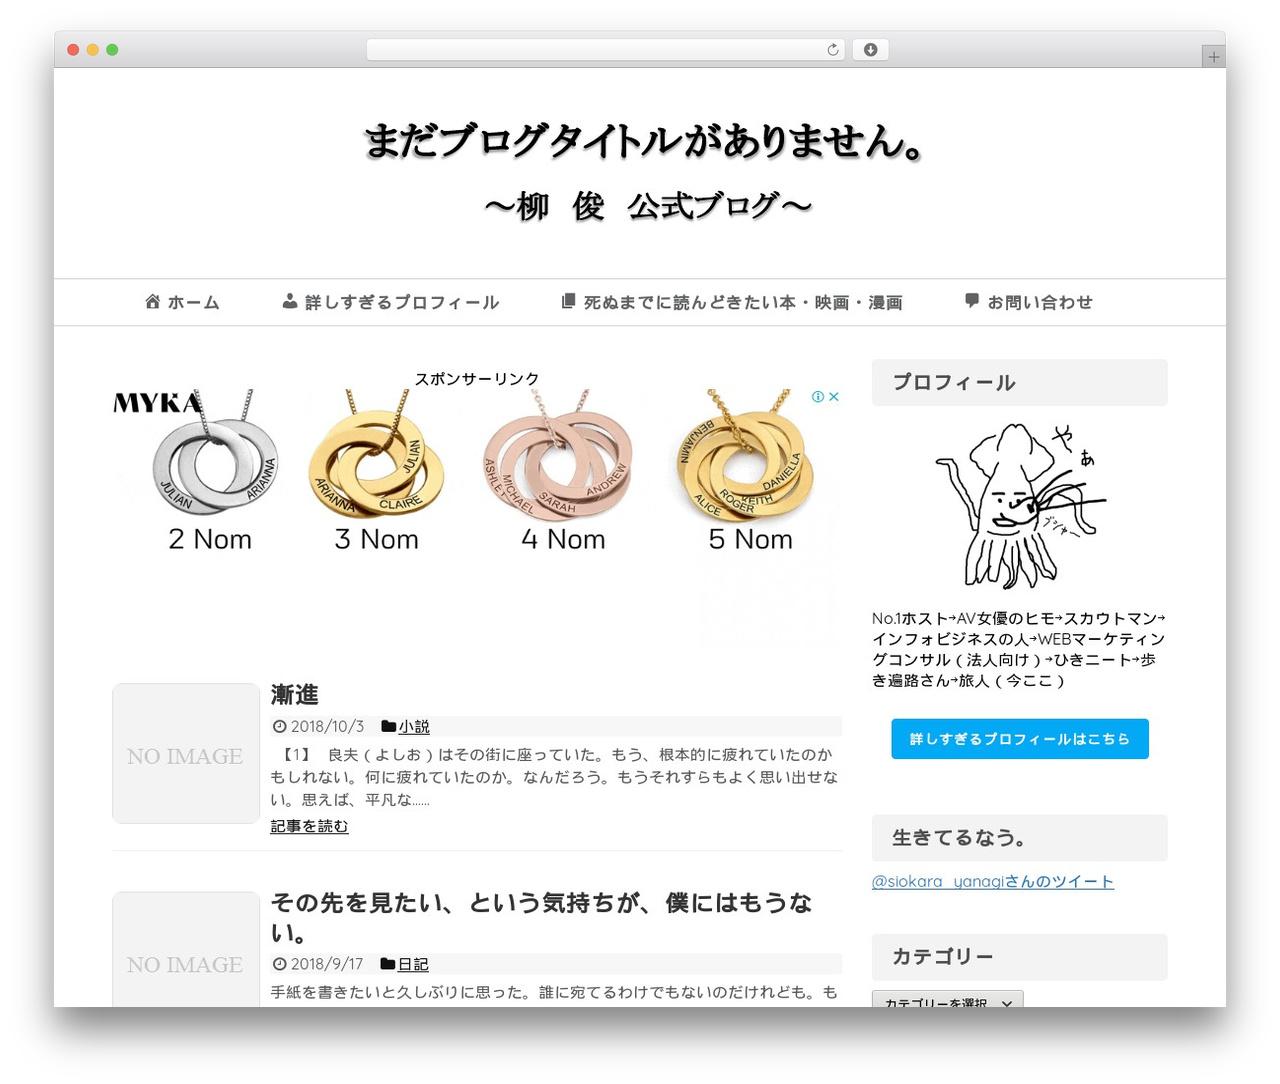 simplicity2 wordpress website template by yhira siokara yanagi com